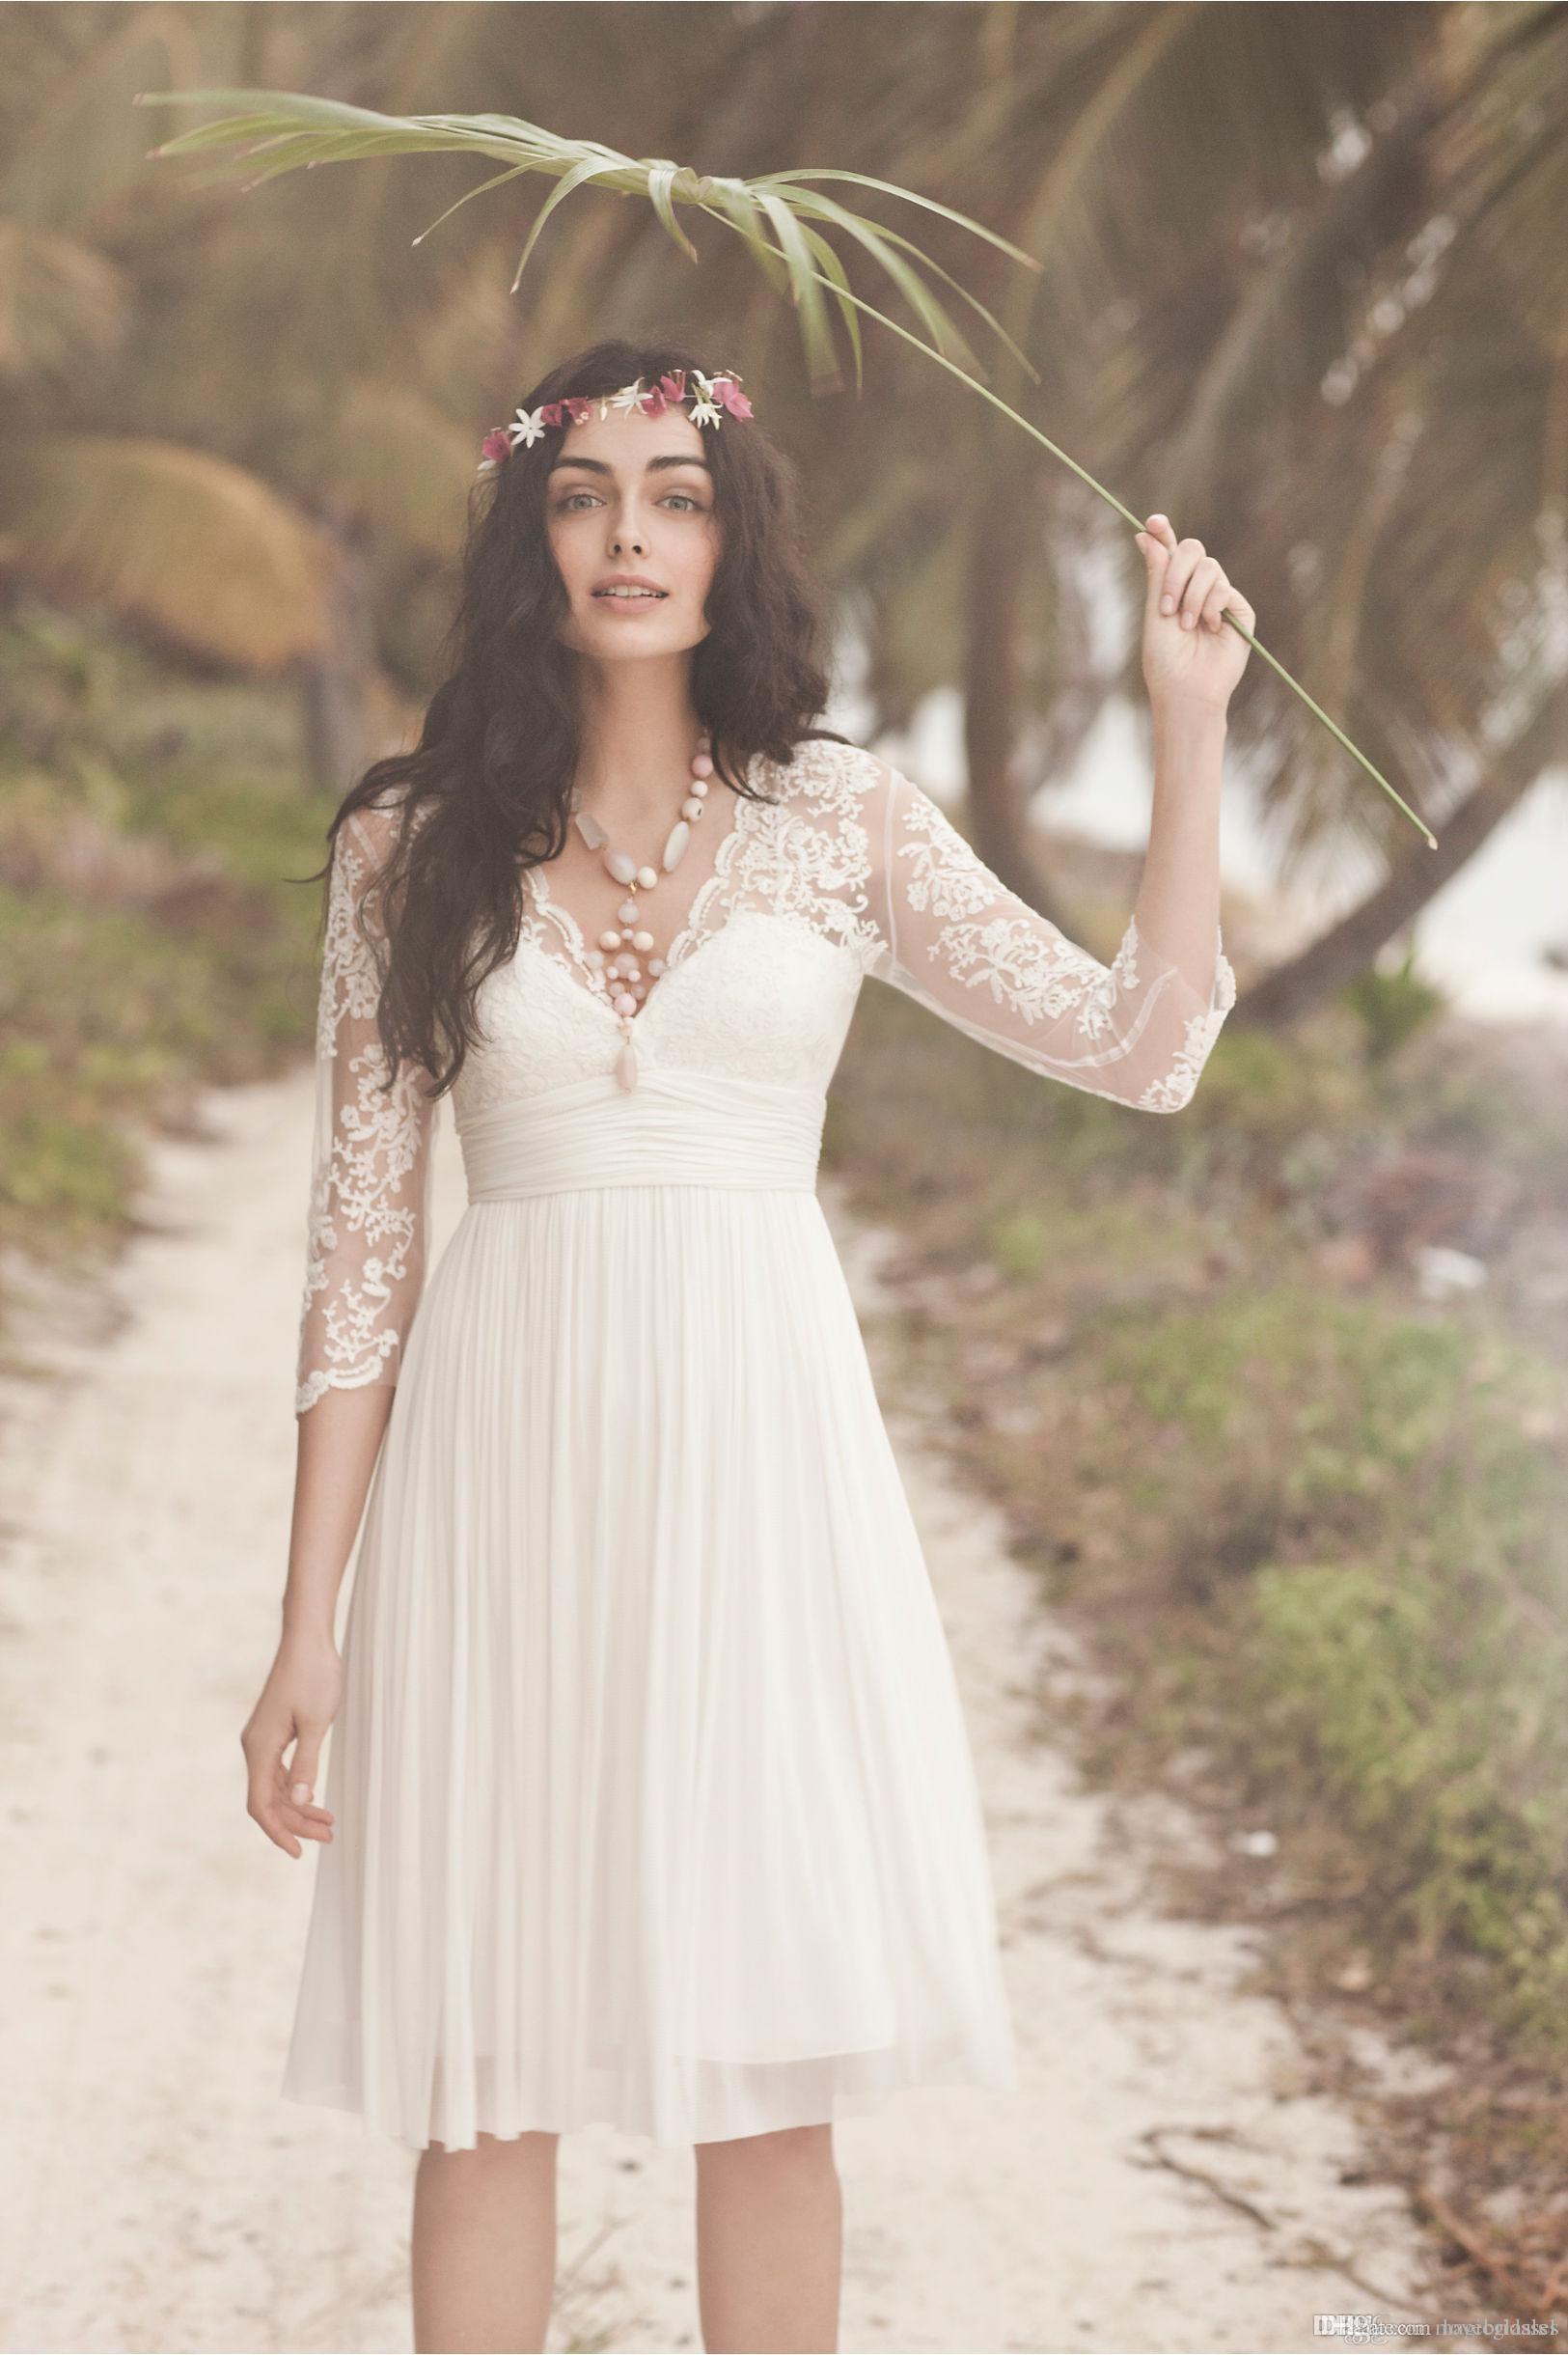 2019 Boho Sheer 3/4 Long Sleeve Short Lace Wedding Dresses V Neck Pleated A-Line Knee Length Chiffon Beach Bridal Gowns